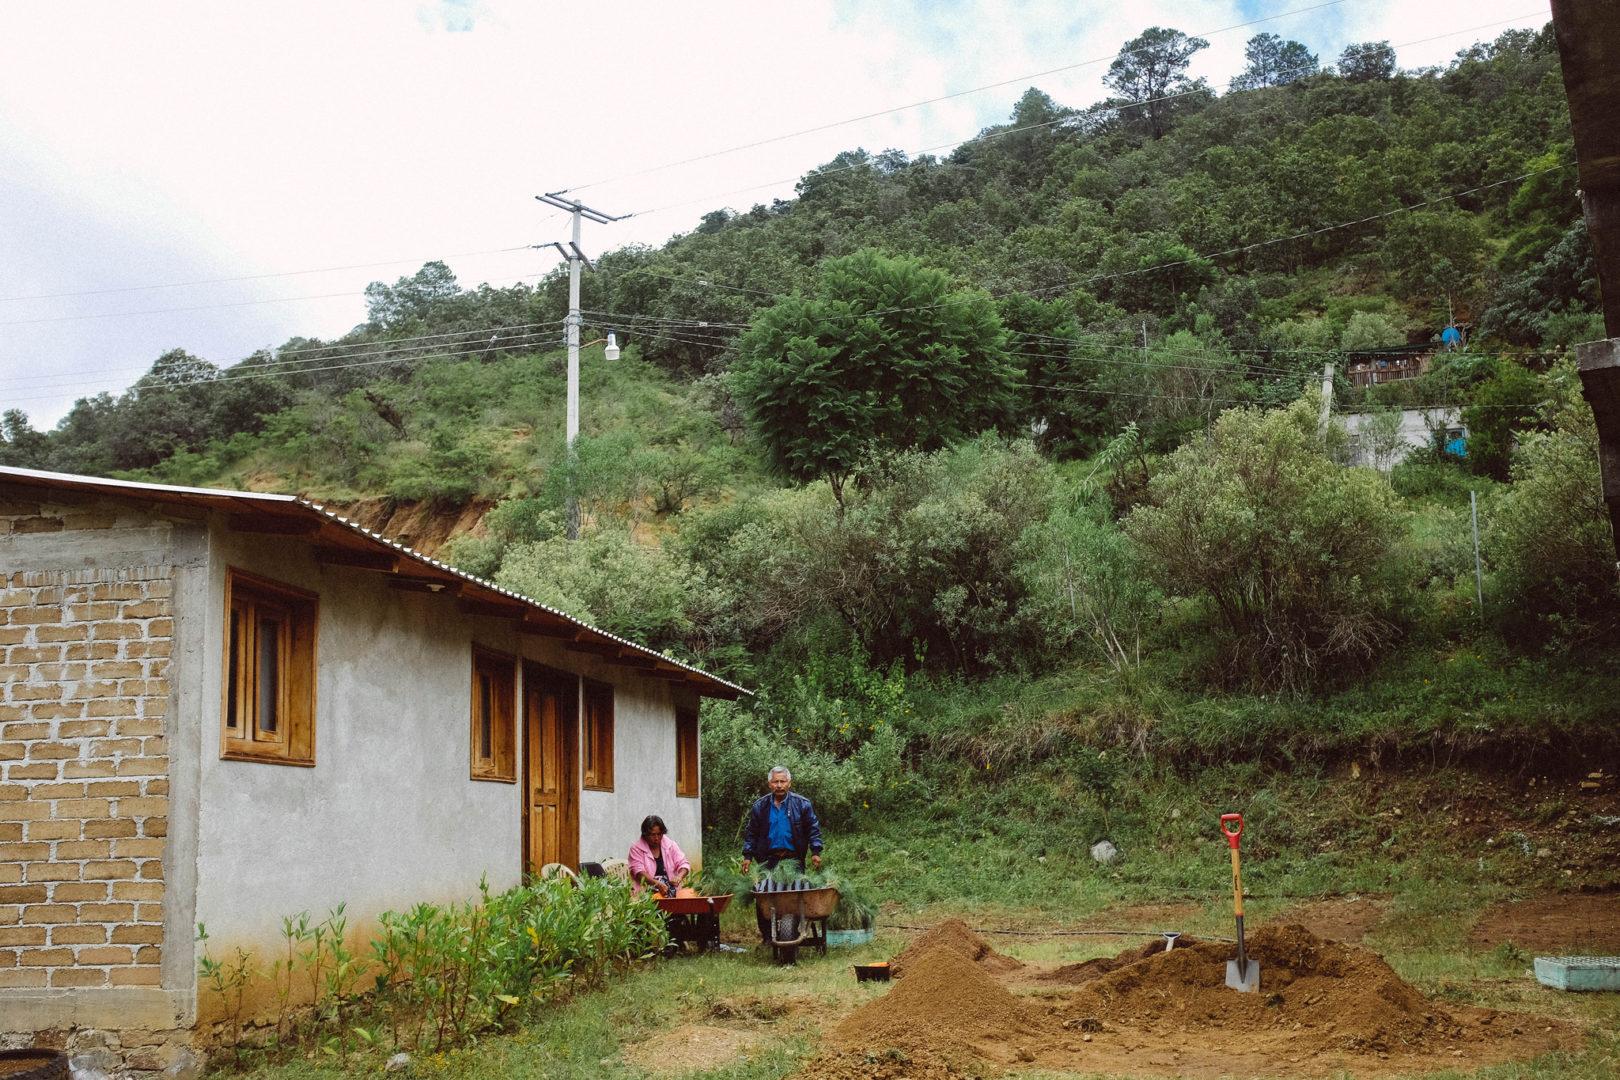 The community of La Paz prepares for graduation